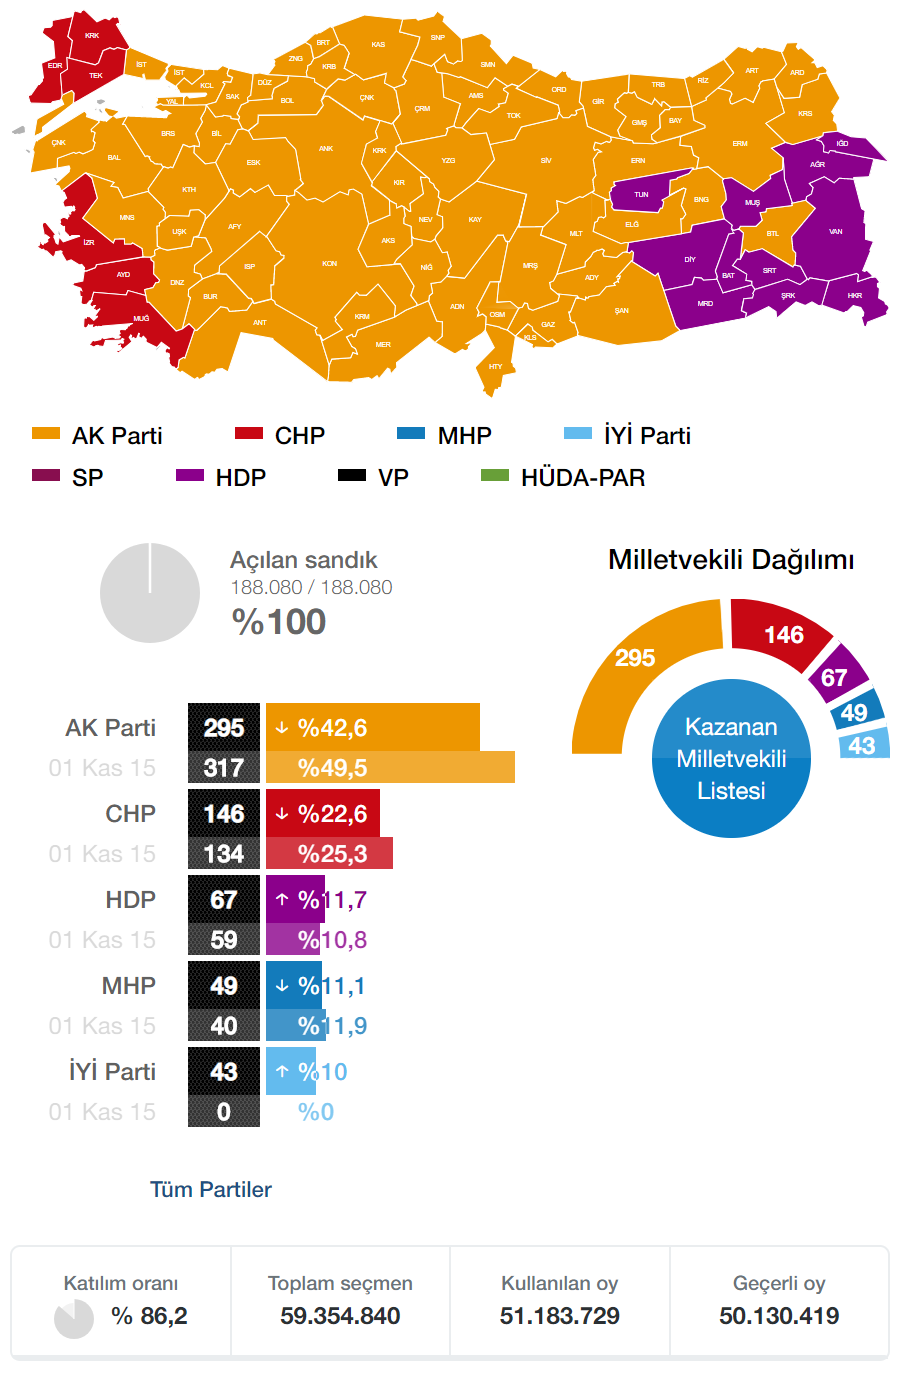 2018 Genel Seçimi